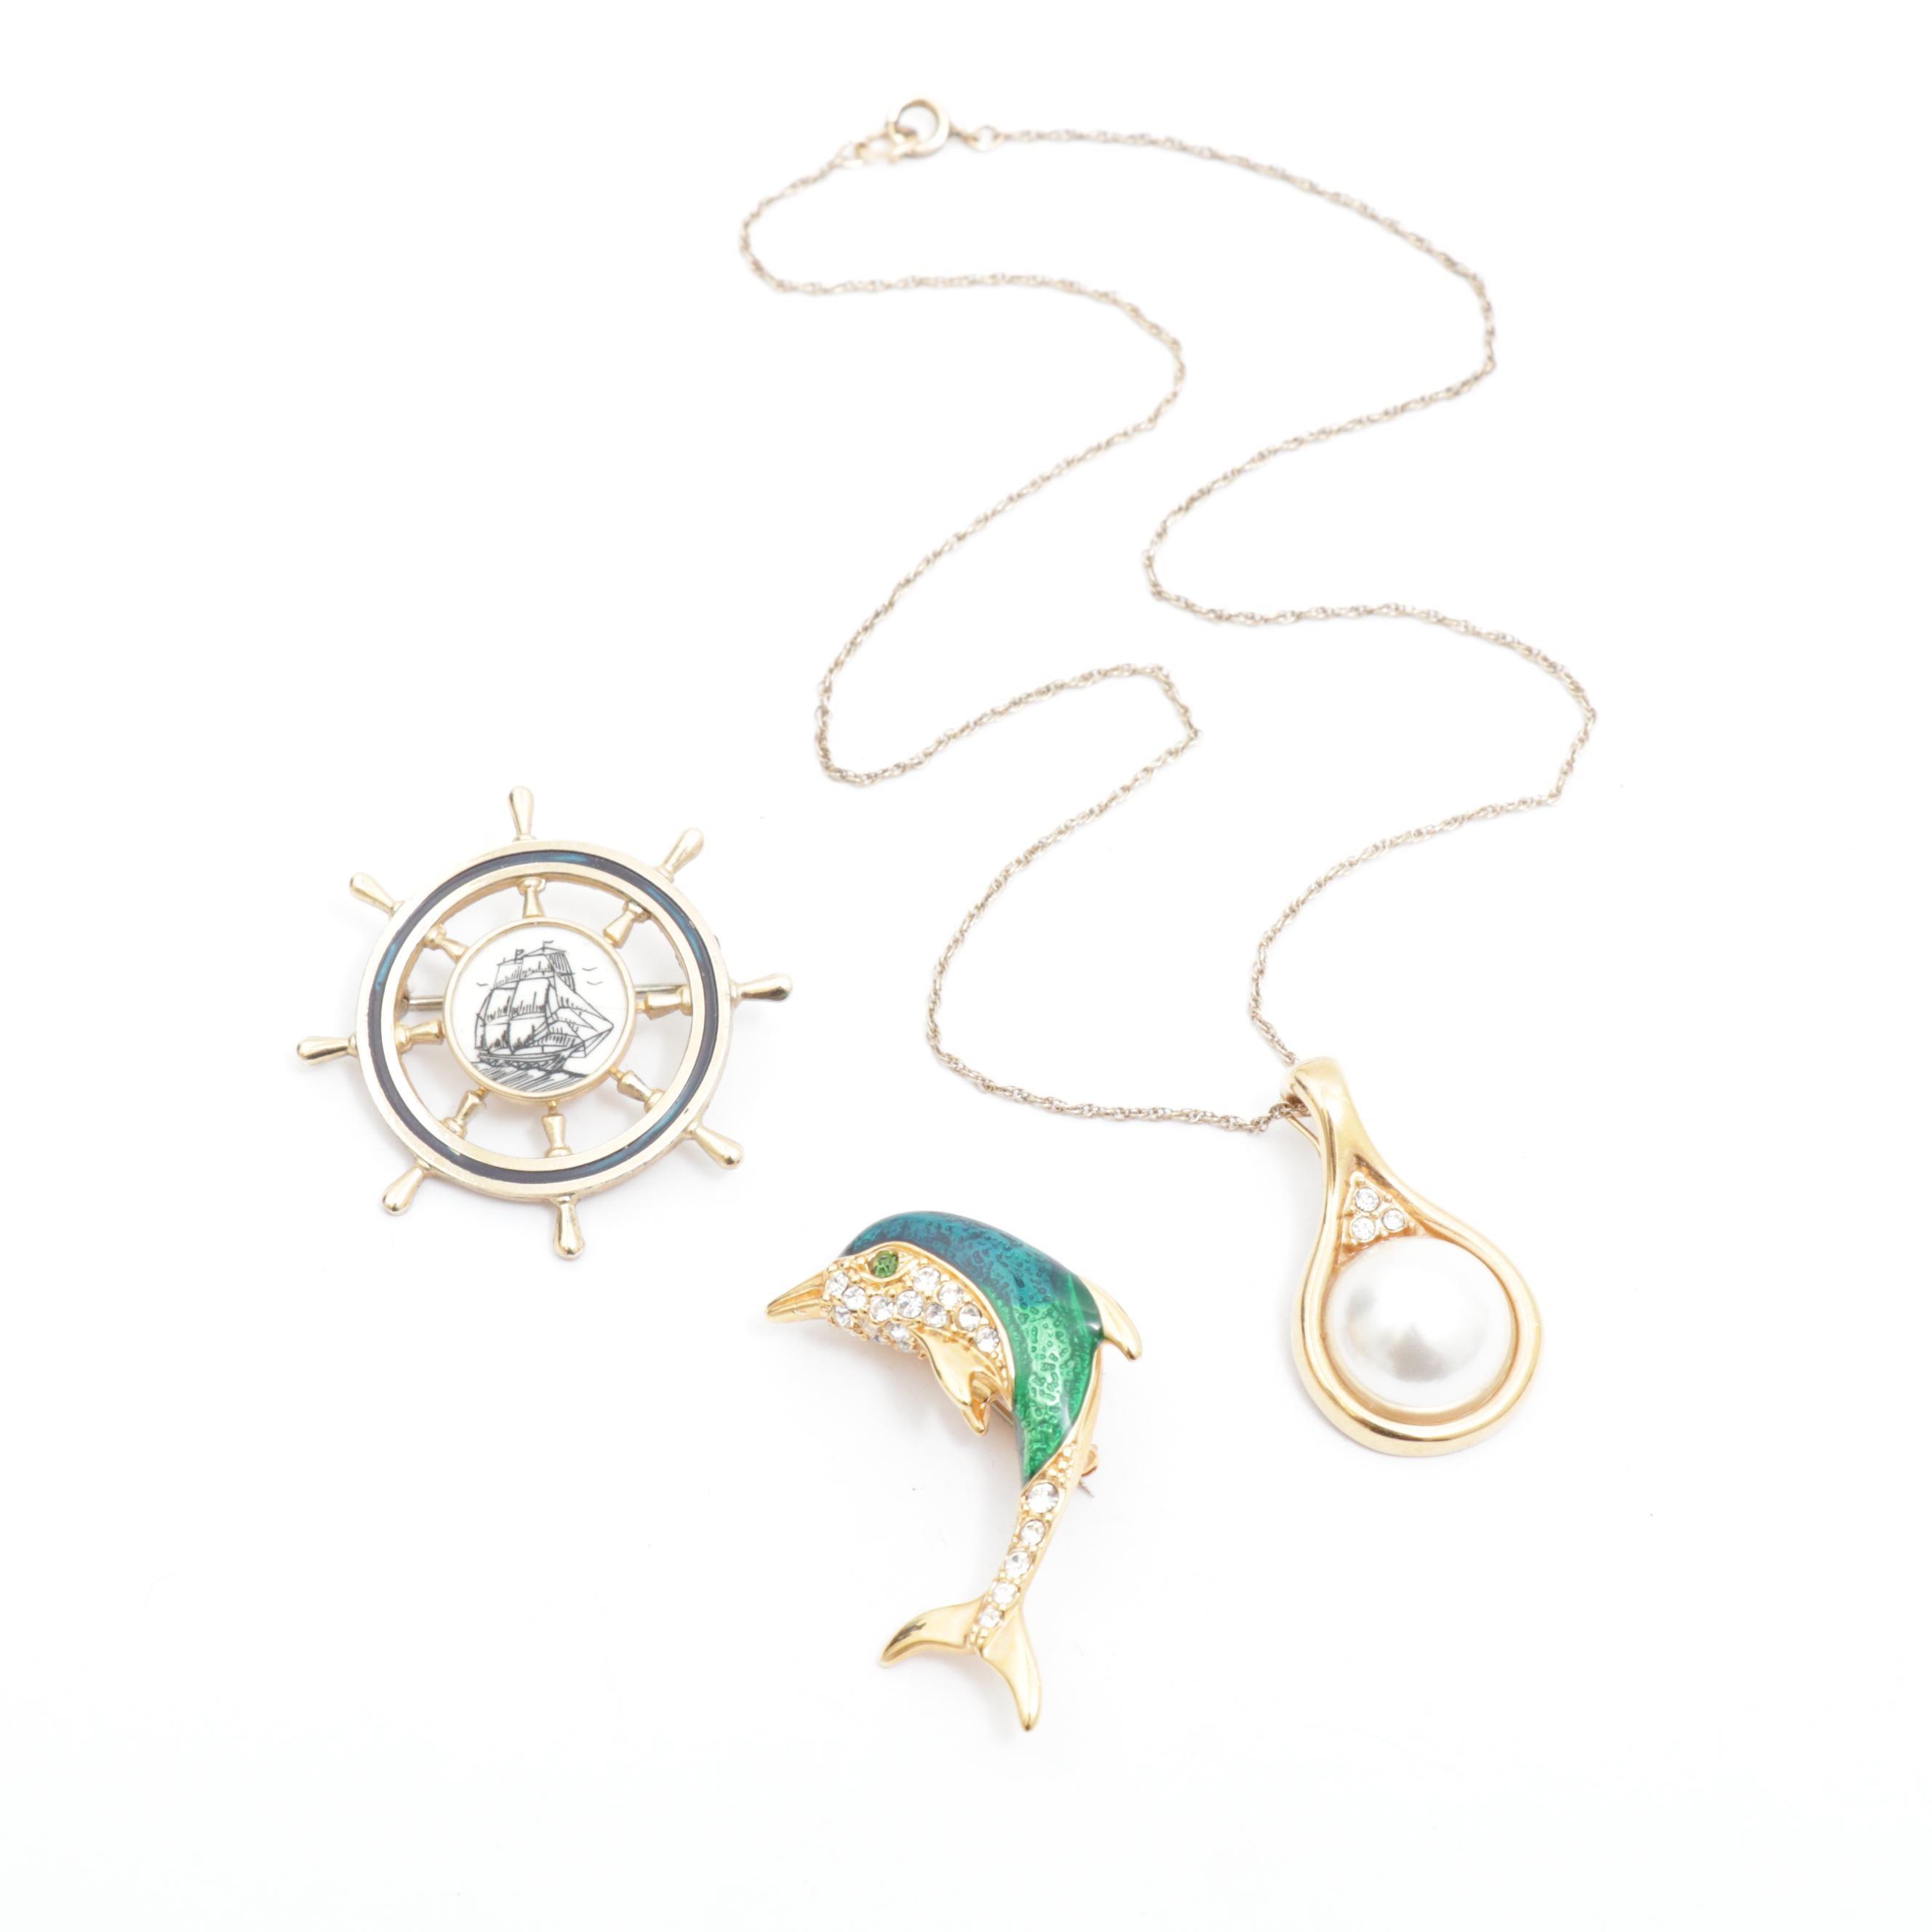 Krementz Jewelry, Vintage